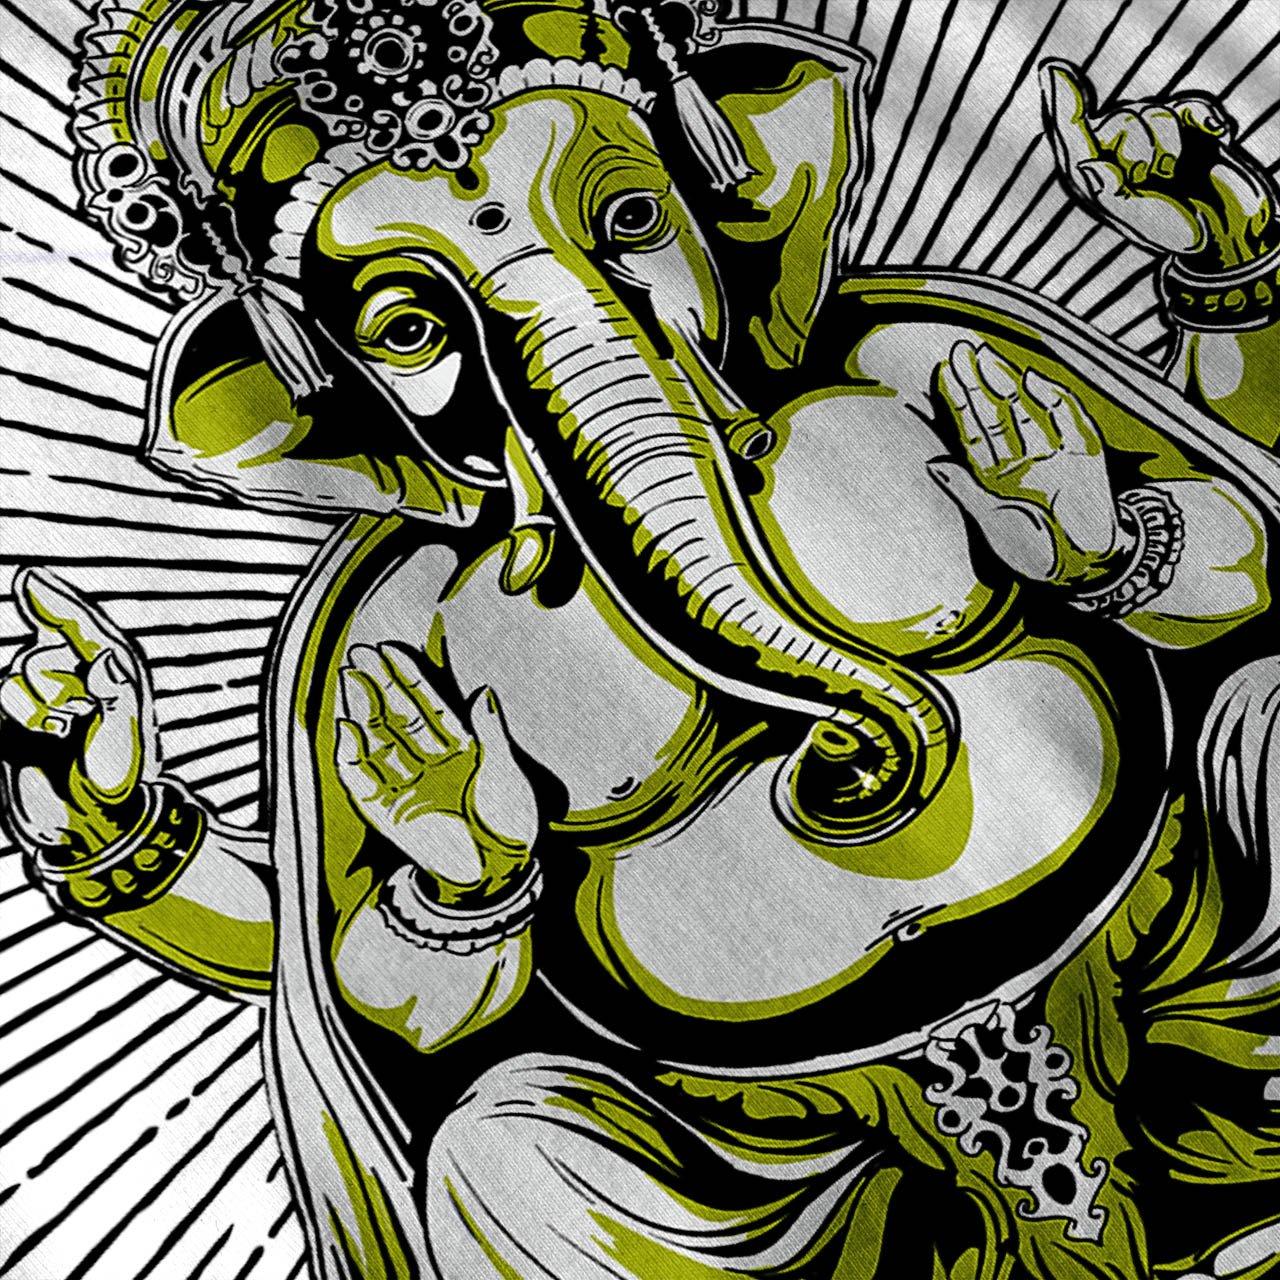 Wellcoda Spirituel Gu/érisseur Dieu Homme D/ébardeur Ganesha/ Chemise de Sport Actif